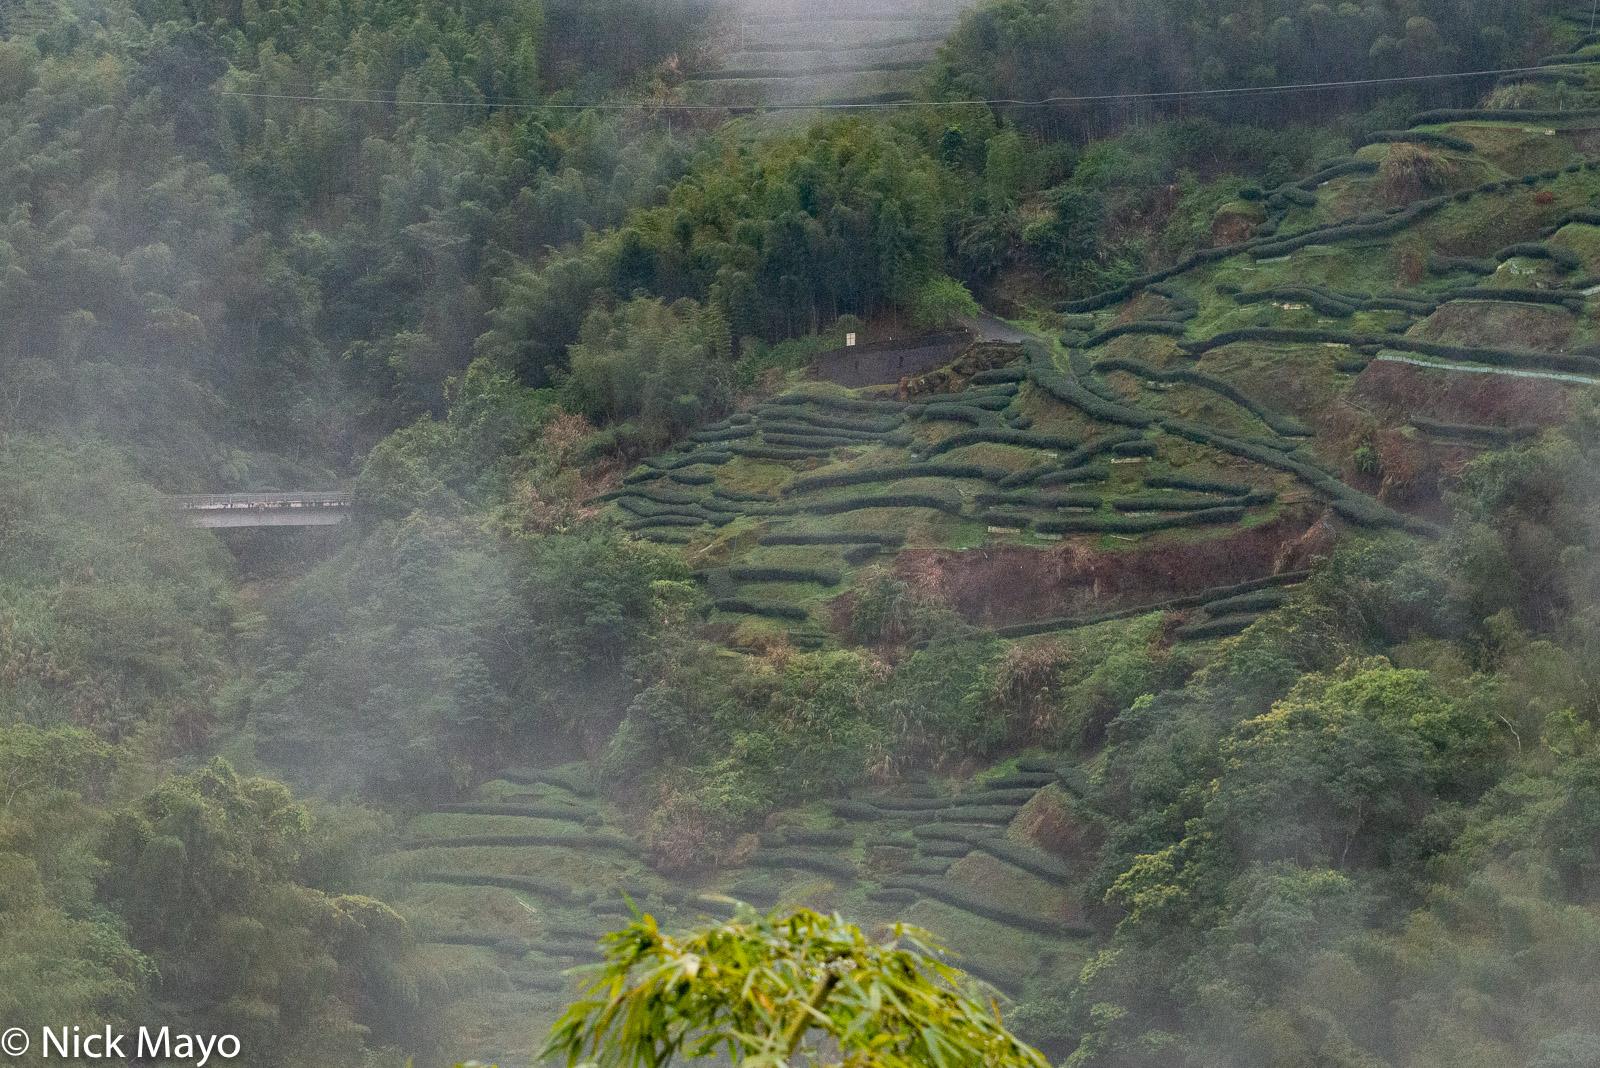 A mountainside tea plantation at Cui Shan Cha Yuan in Nantou County.